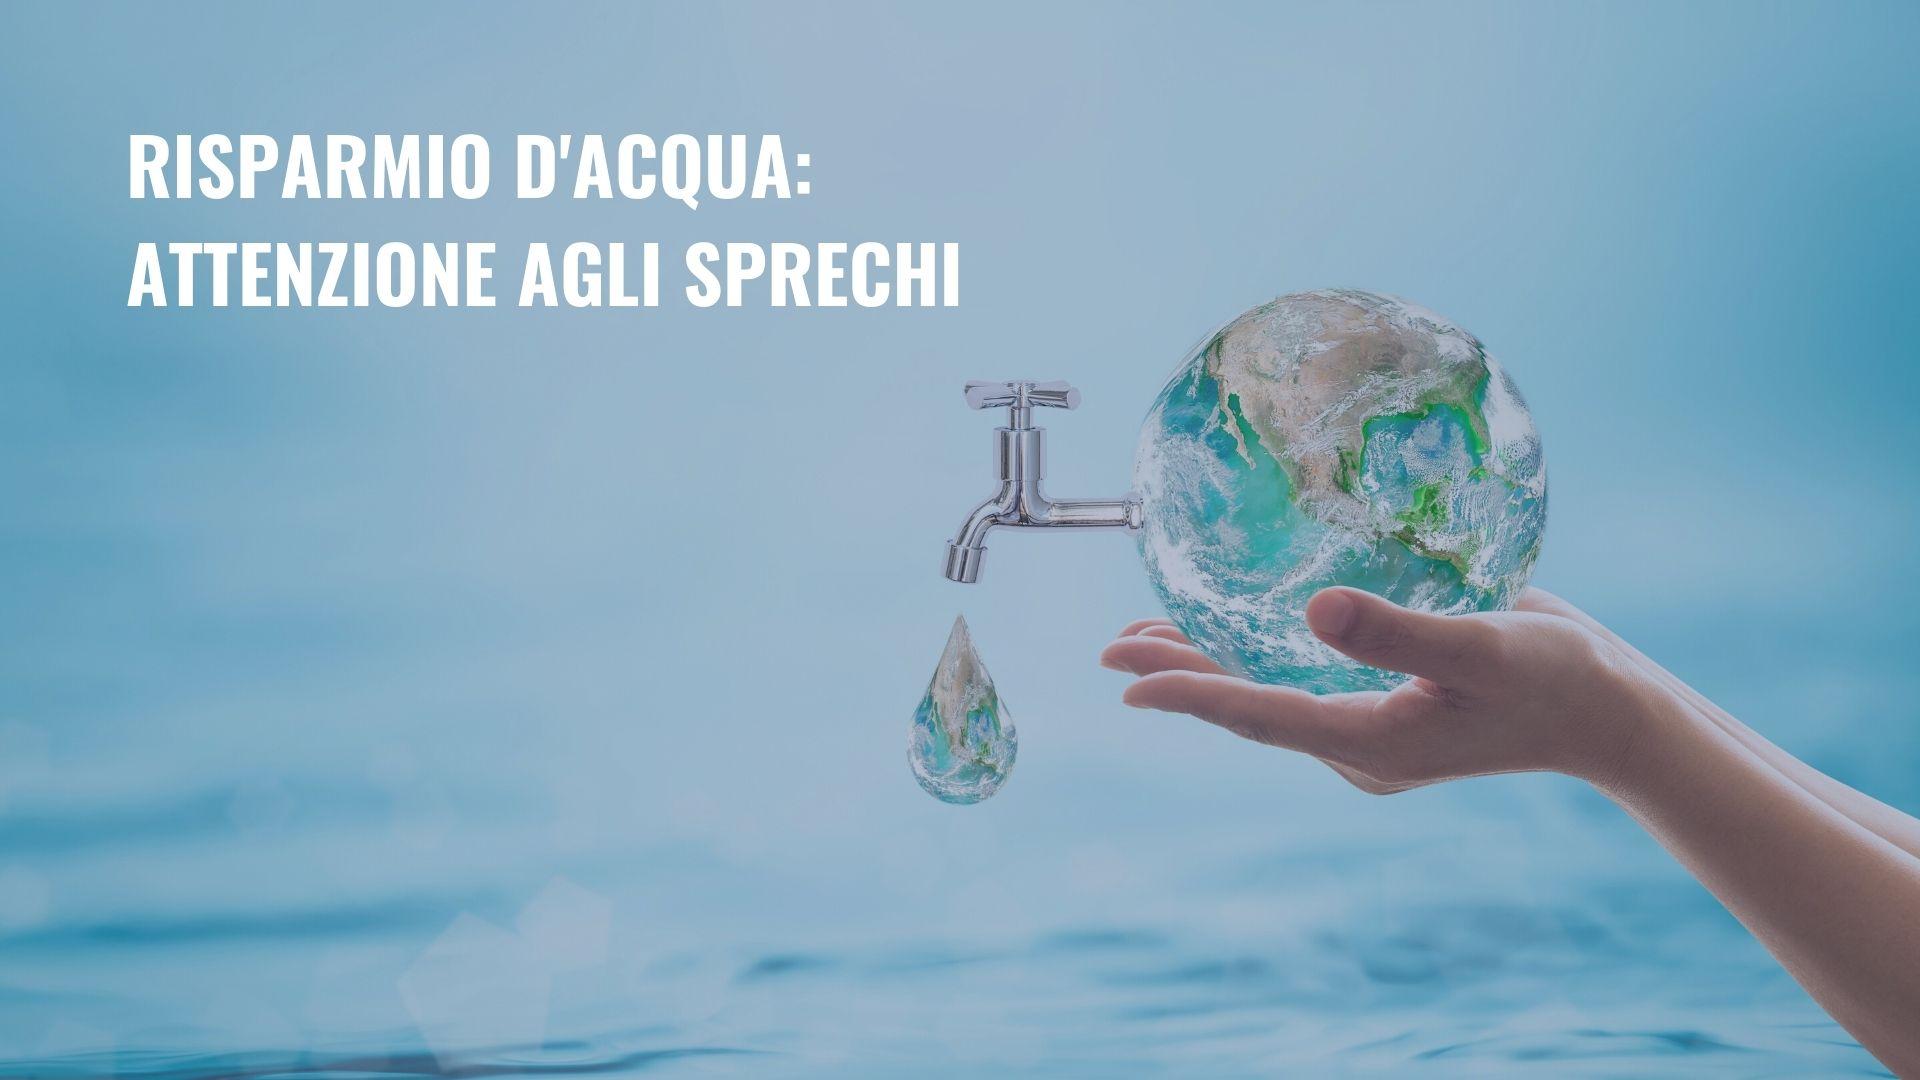 Risparmio d'acqua